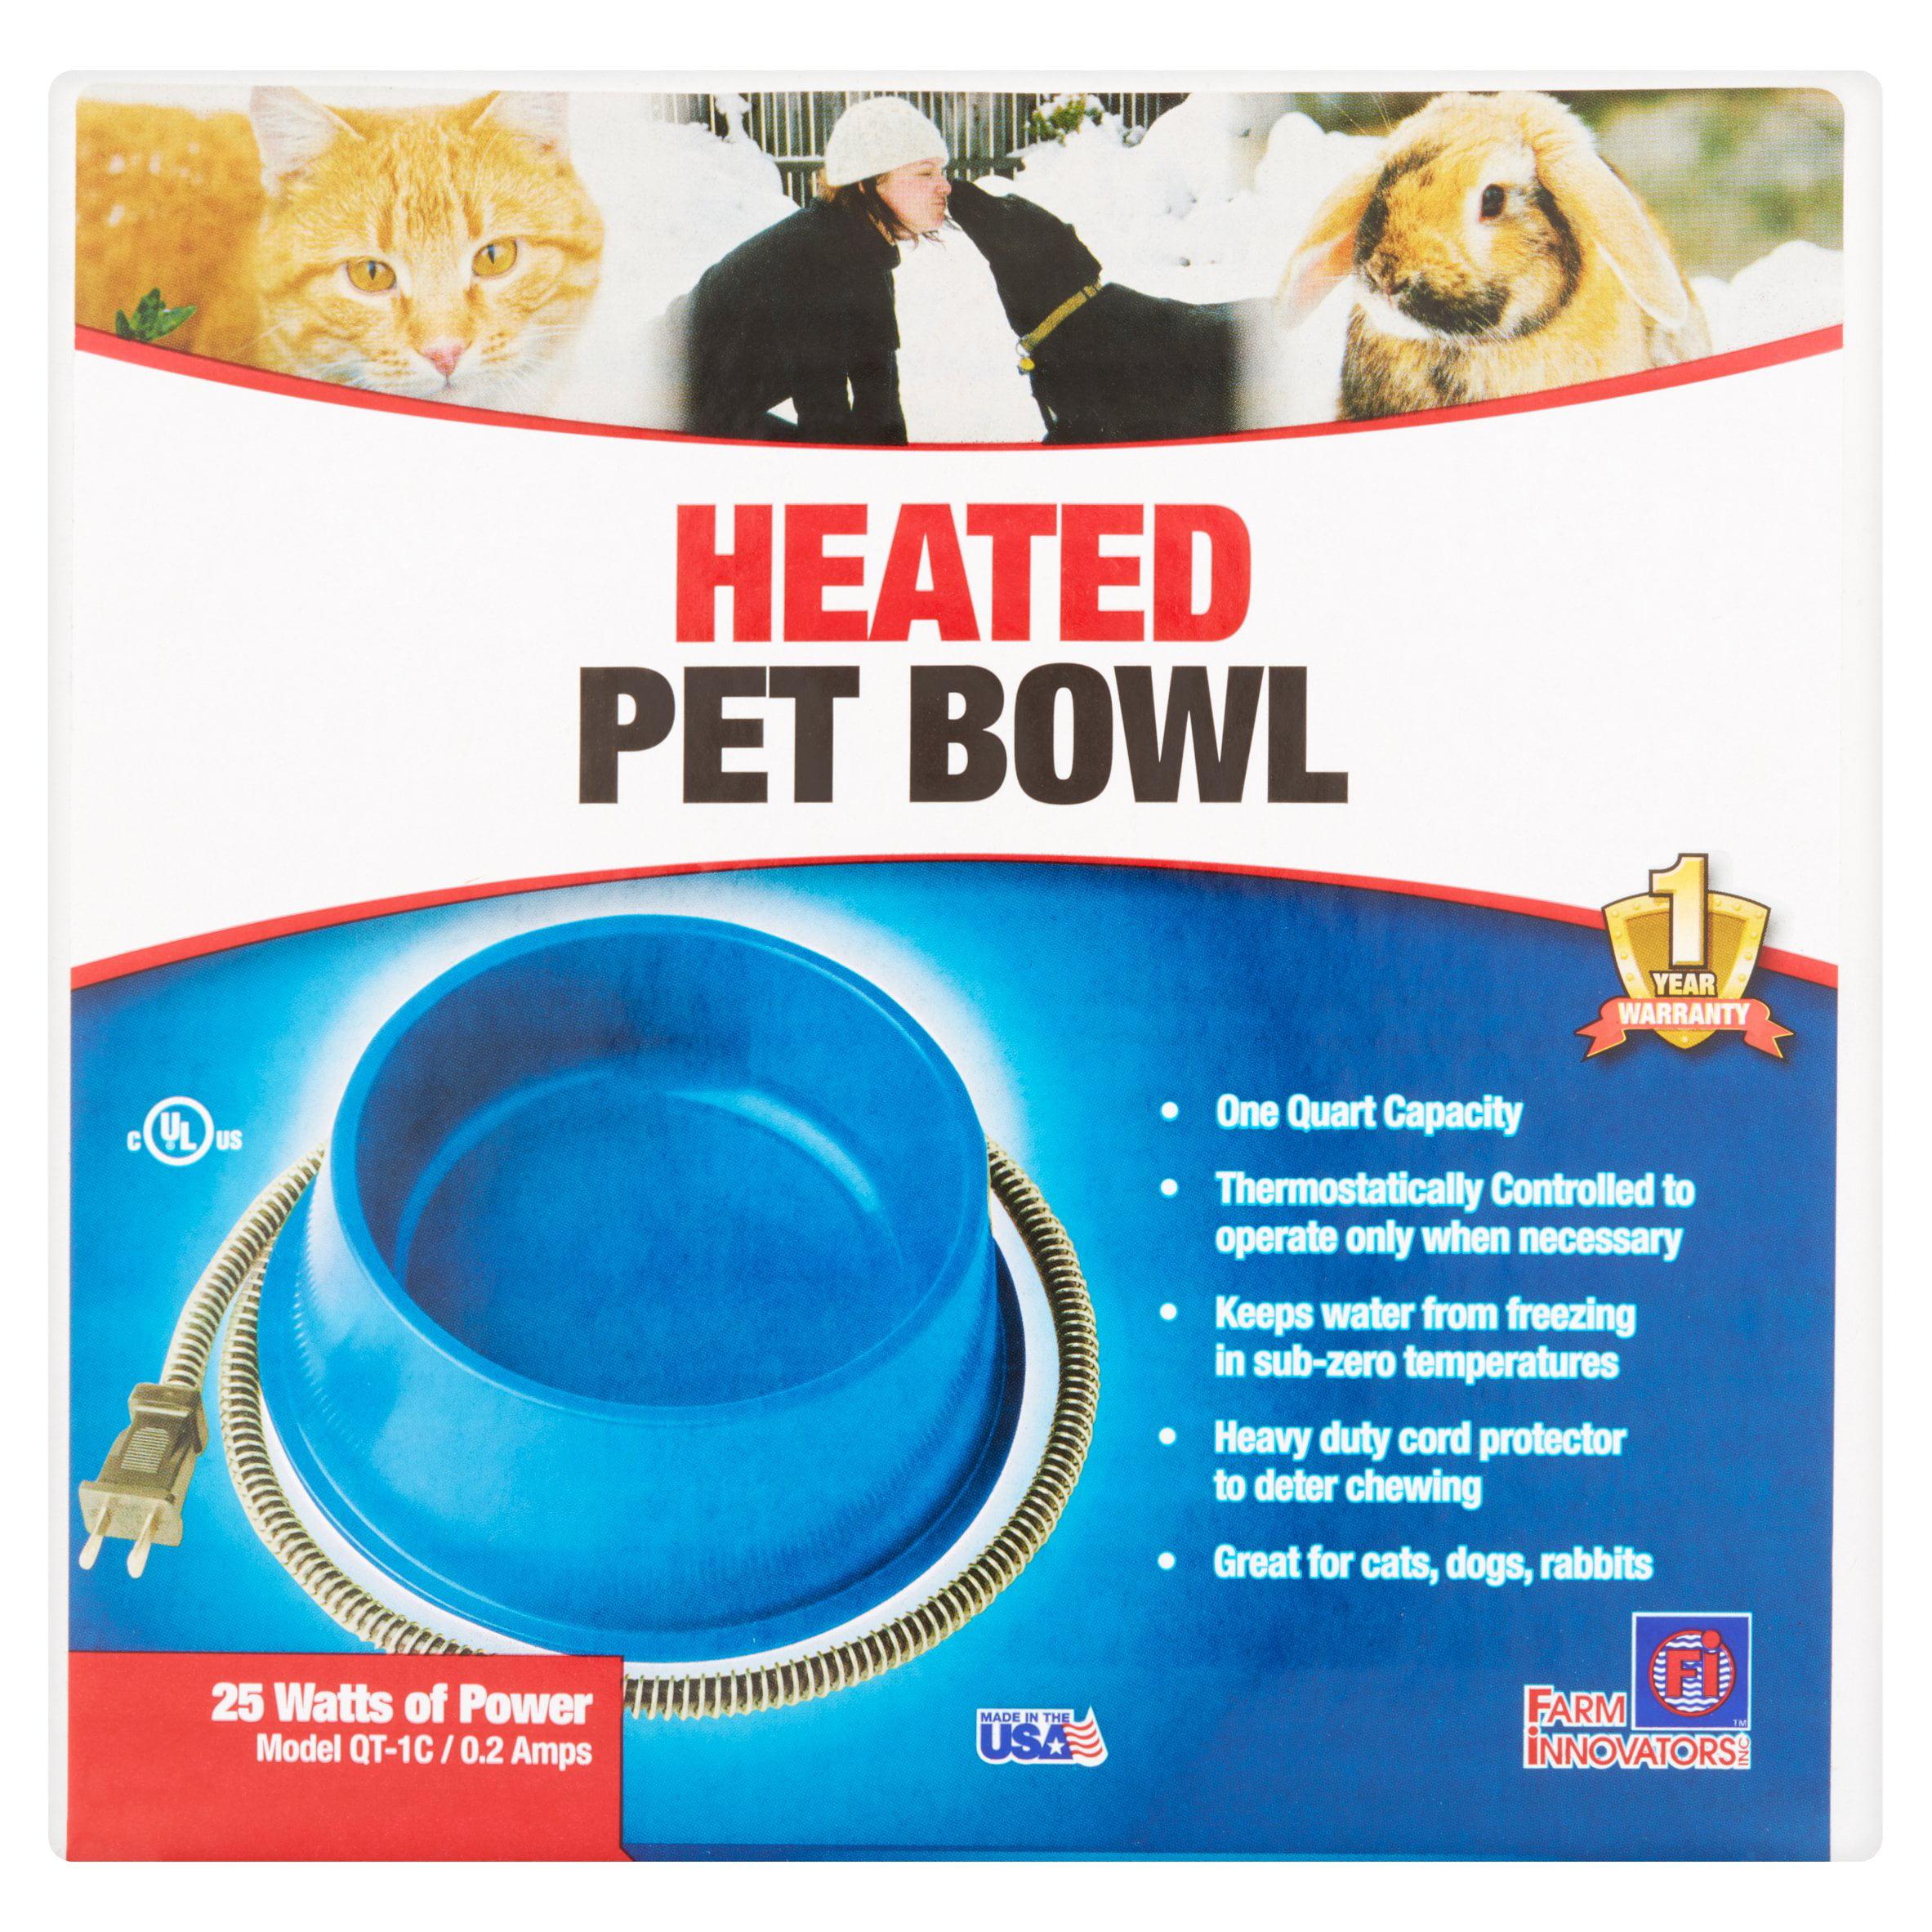 Farm Innovators 25 Watts of Power Heated Pet Bowl by Heated Pet Bowls